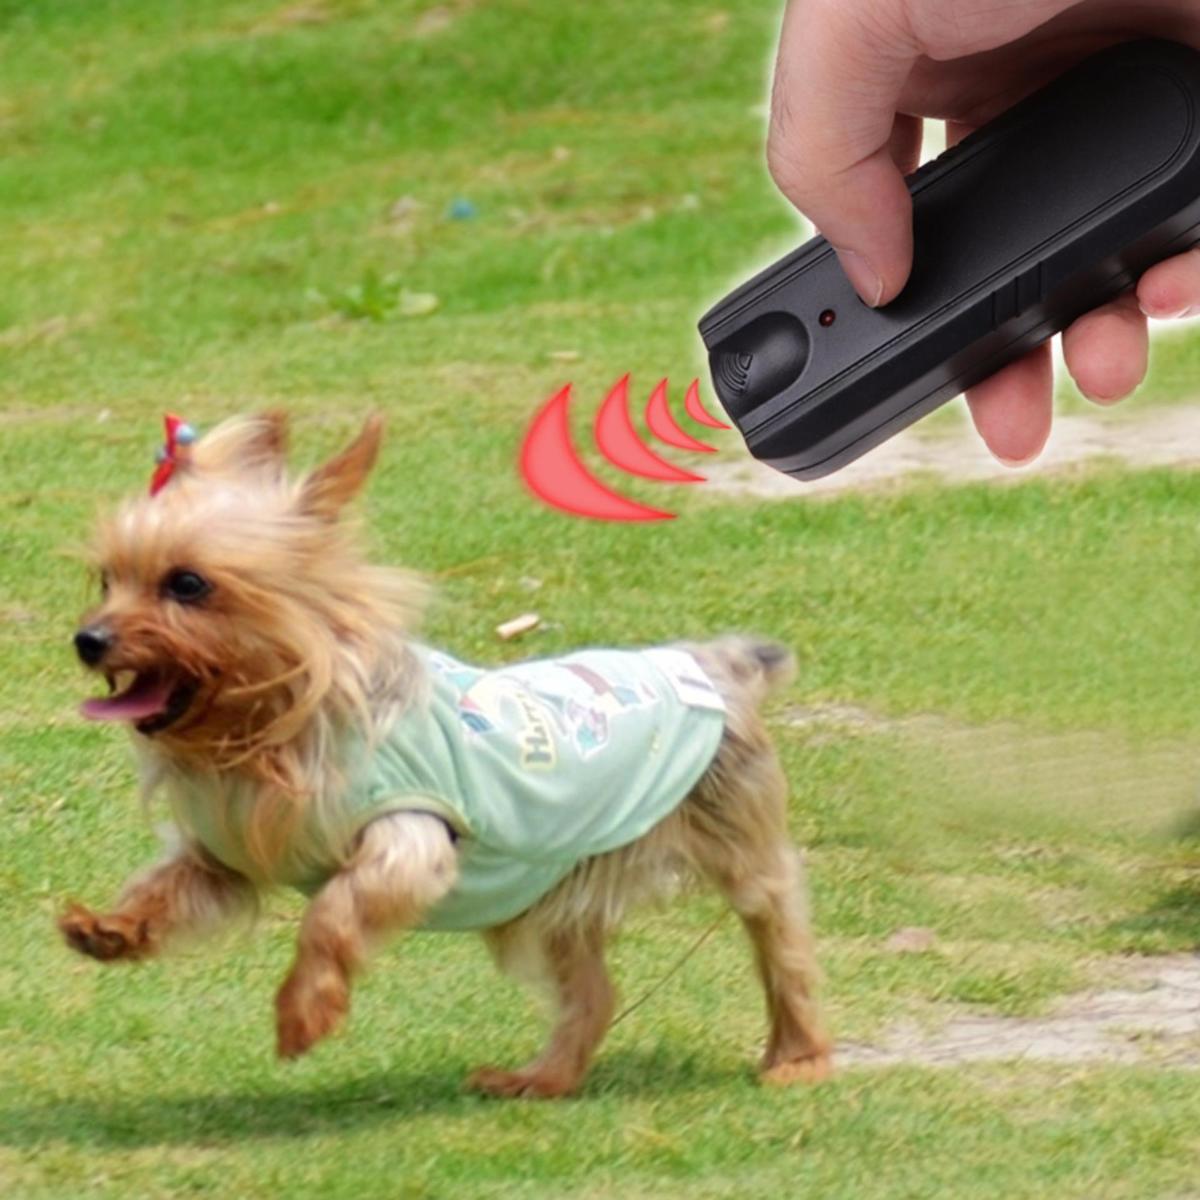 Ultrasone Anti Blaf Hond Repeller Met LED - Honden Trainer - Trainer Apparaat - Zwart - Dier Vriendelijk kopen